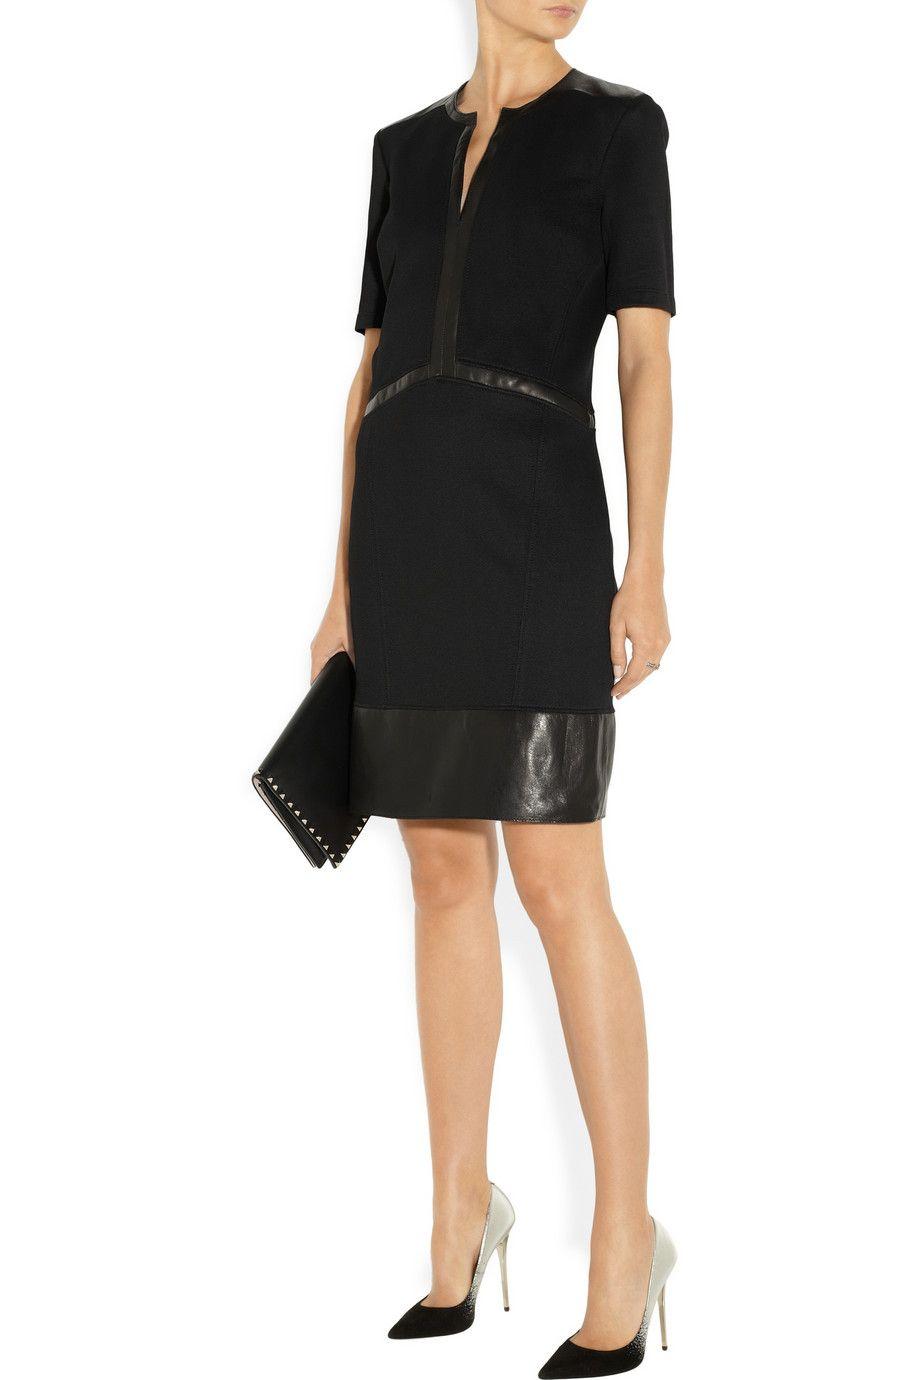 Helmut Lang Motion leathertrimmed stretchknit dress